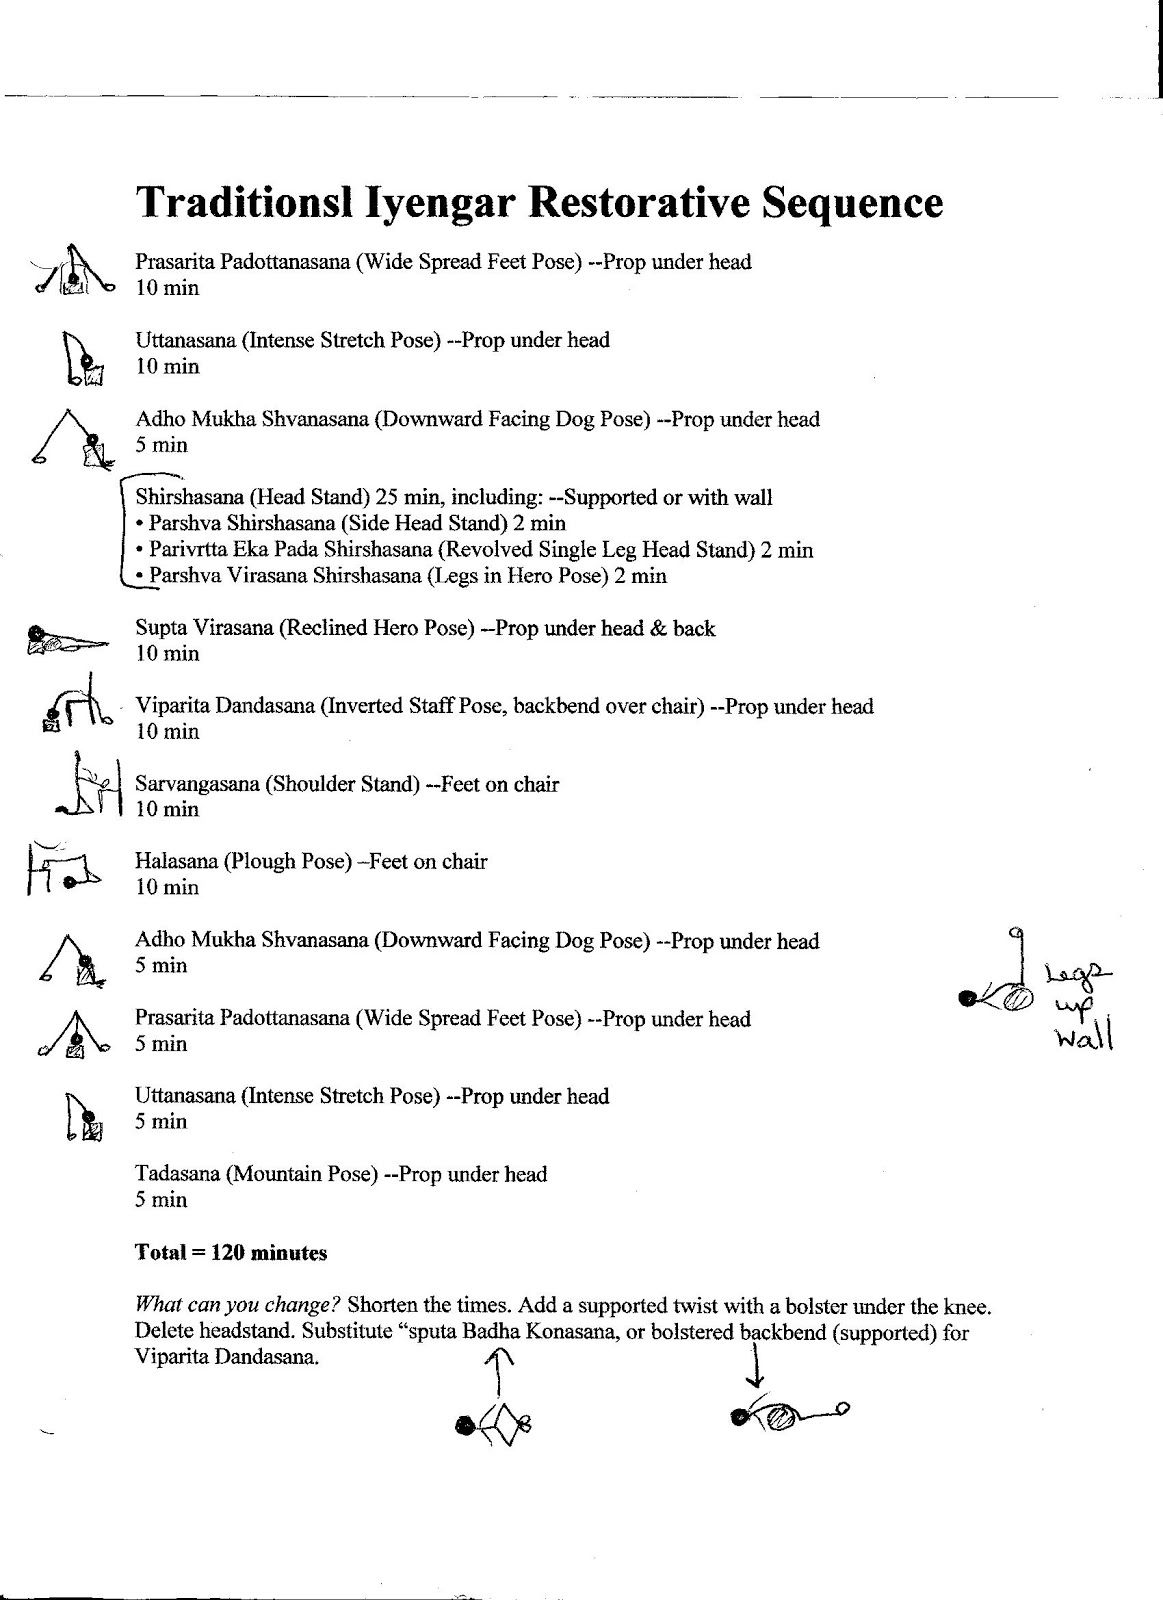 Iyengar Restorative Sequence